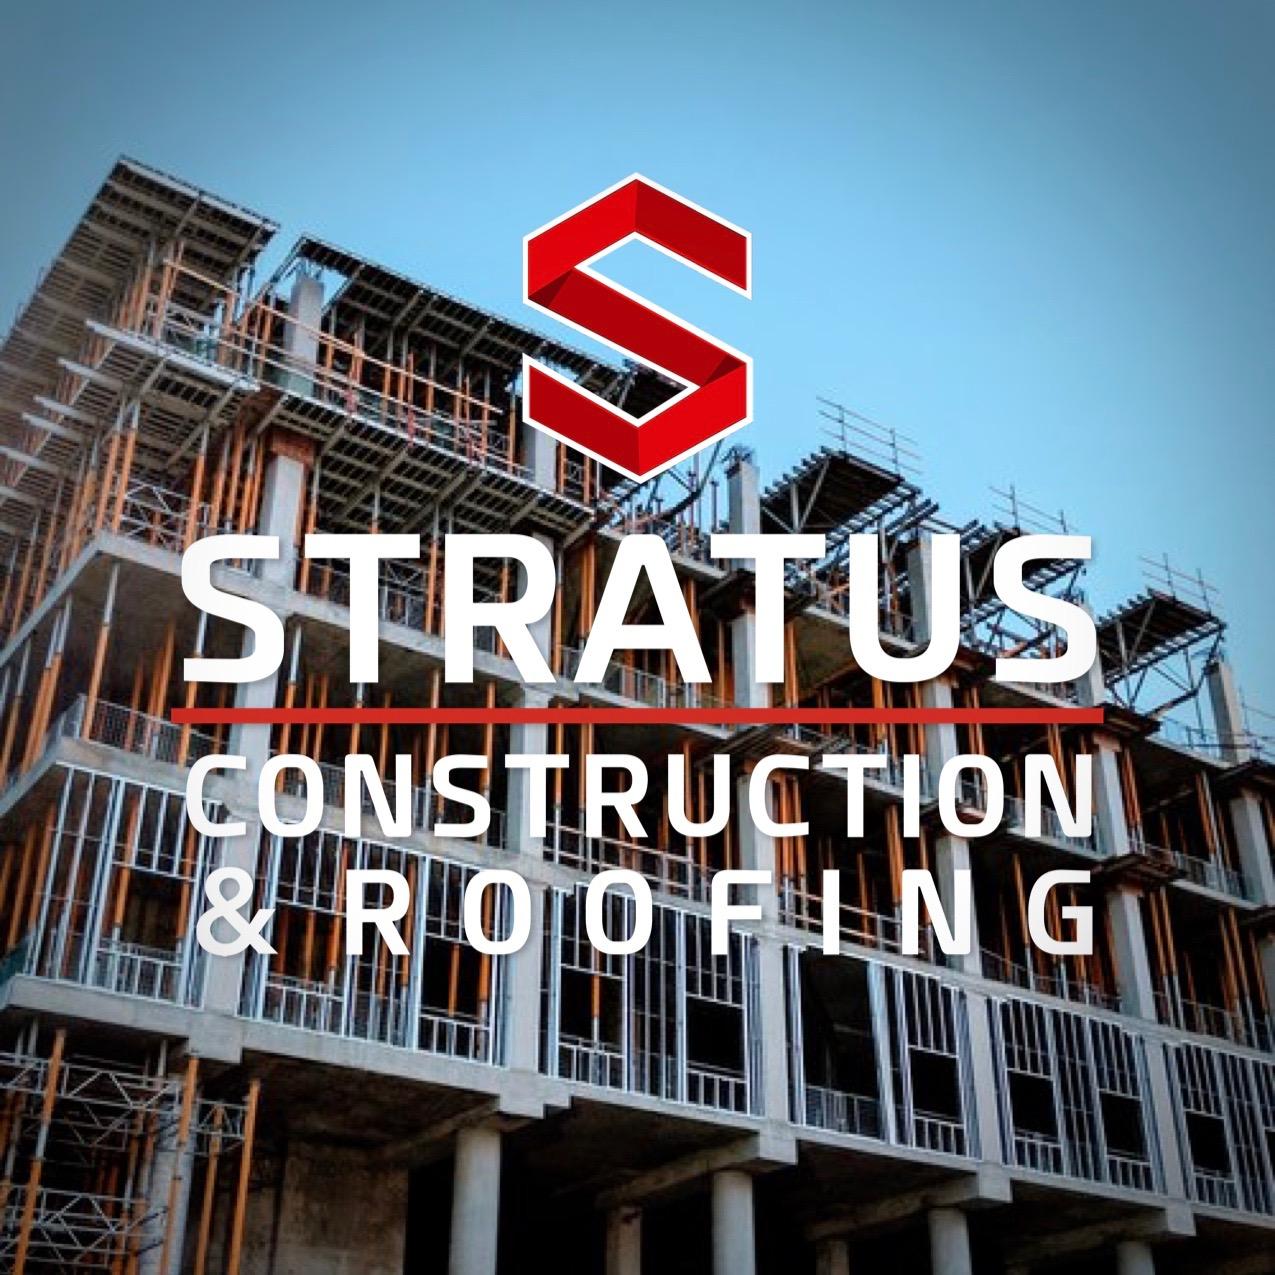 stratus construction holder image website (1).jpg